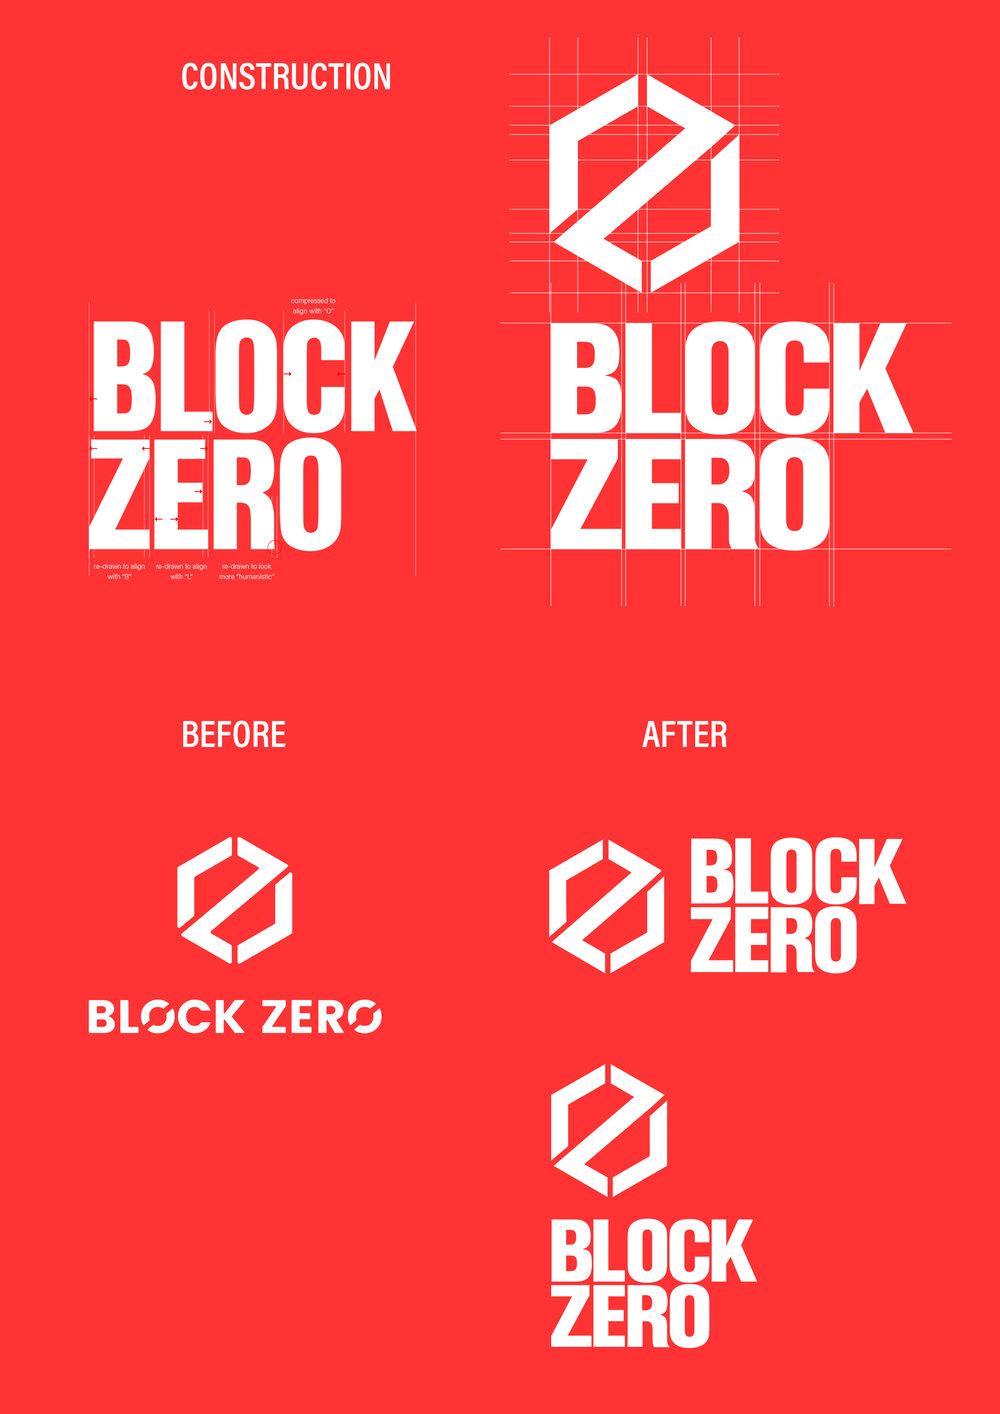 Logotype-construction-Block-Zero-Asimakidis2.jpg